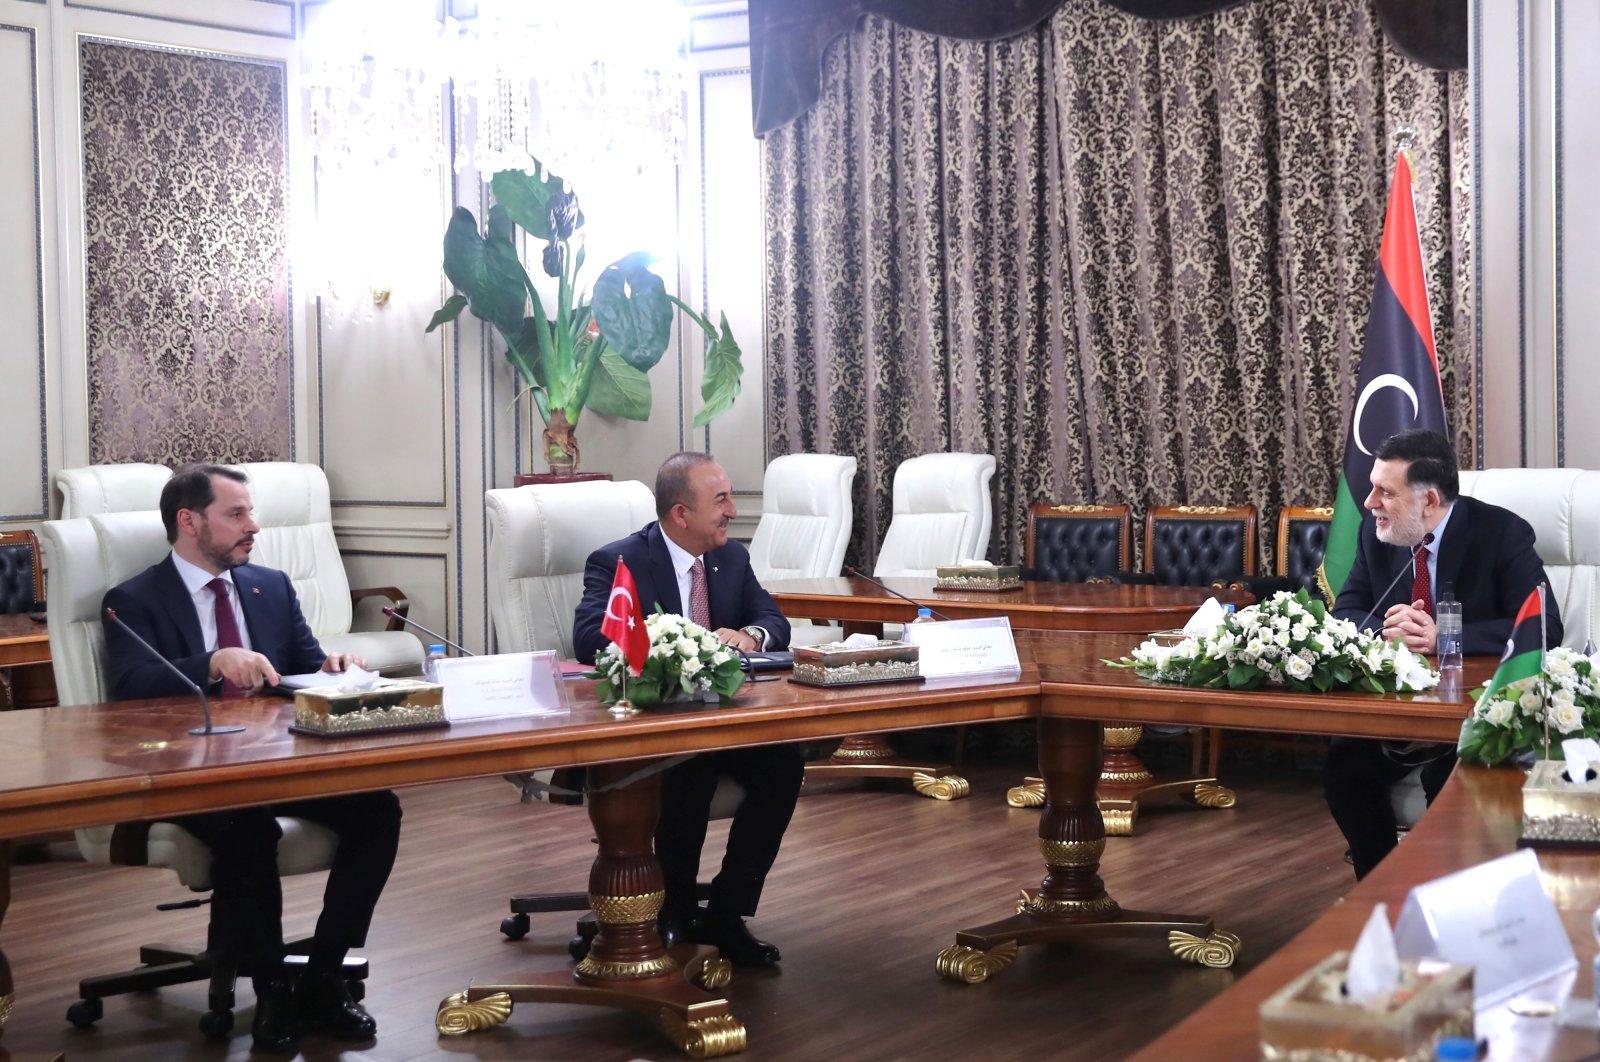 Libya's internationally recognized Prime Minister Fayez Sarraj is seen with Turkey's Foreign Minister Mevlüt Çavuşoğlu and Finance Minister Berat Albayrak during their meeting in Tripoli, Libya, June 17, 2020. (AFP Photo)